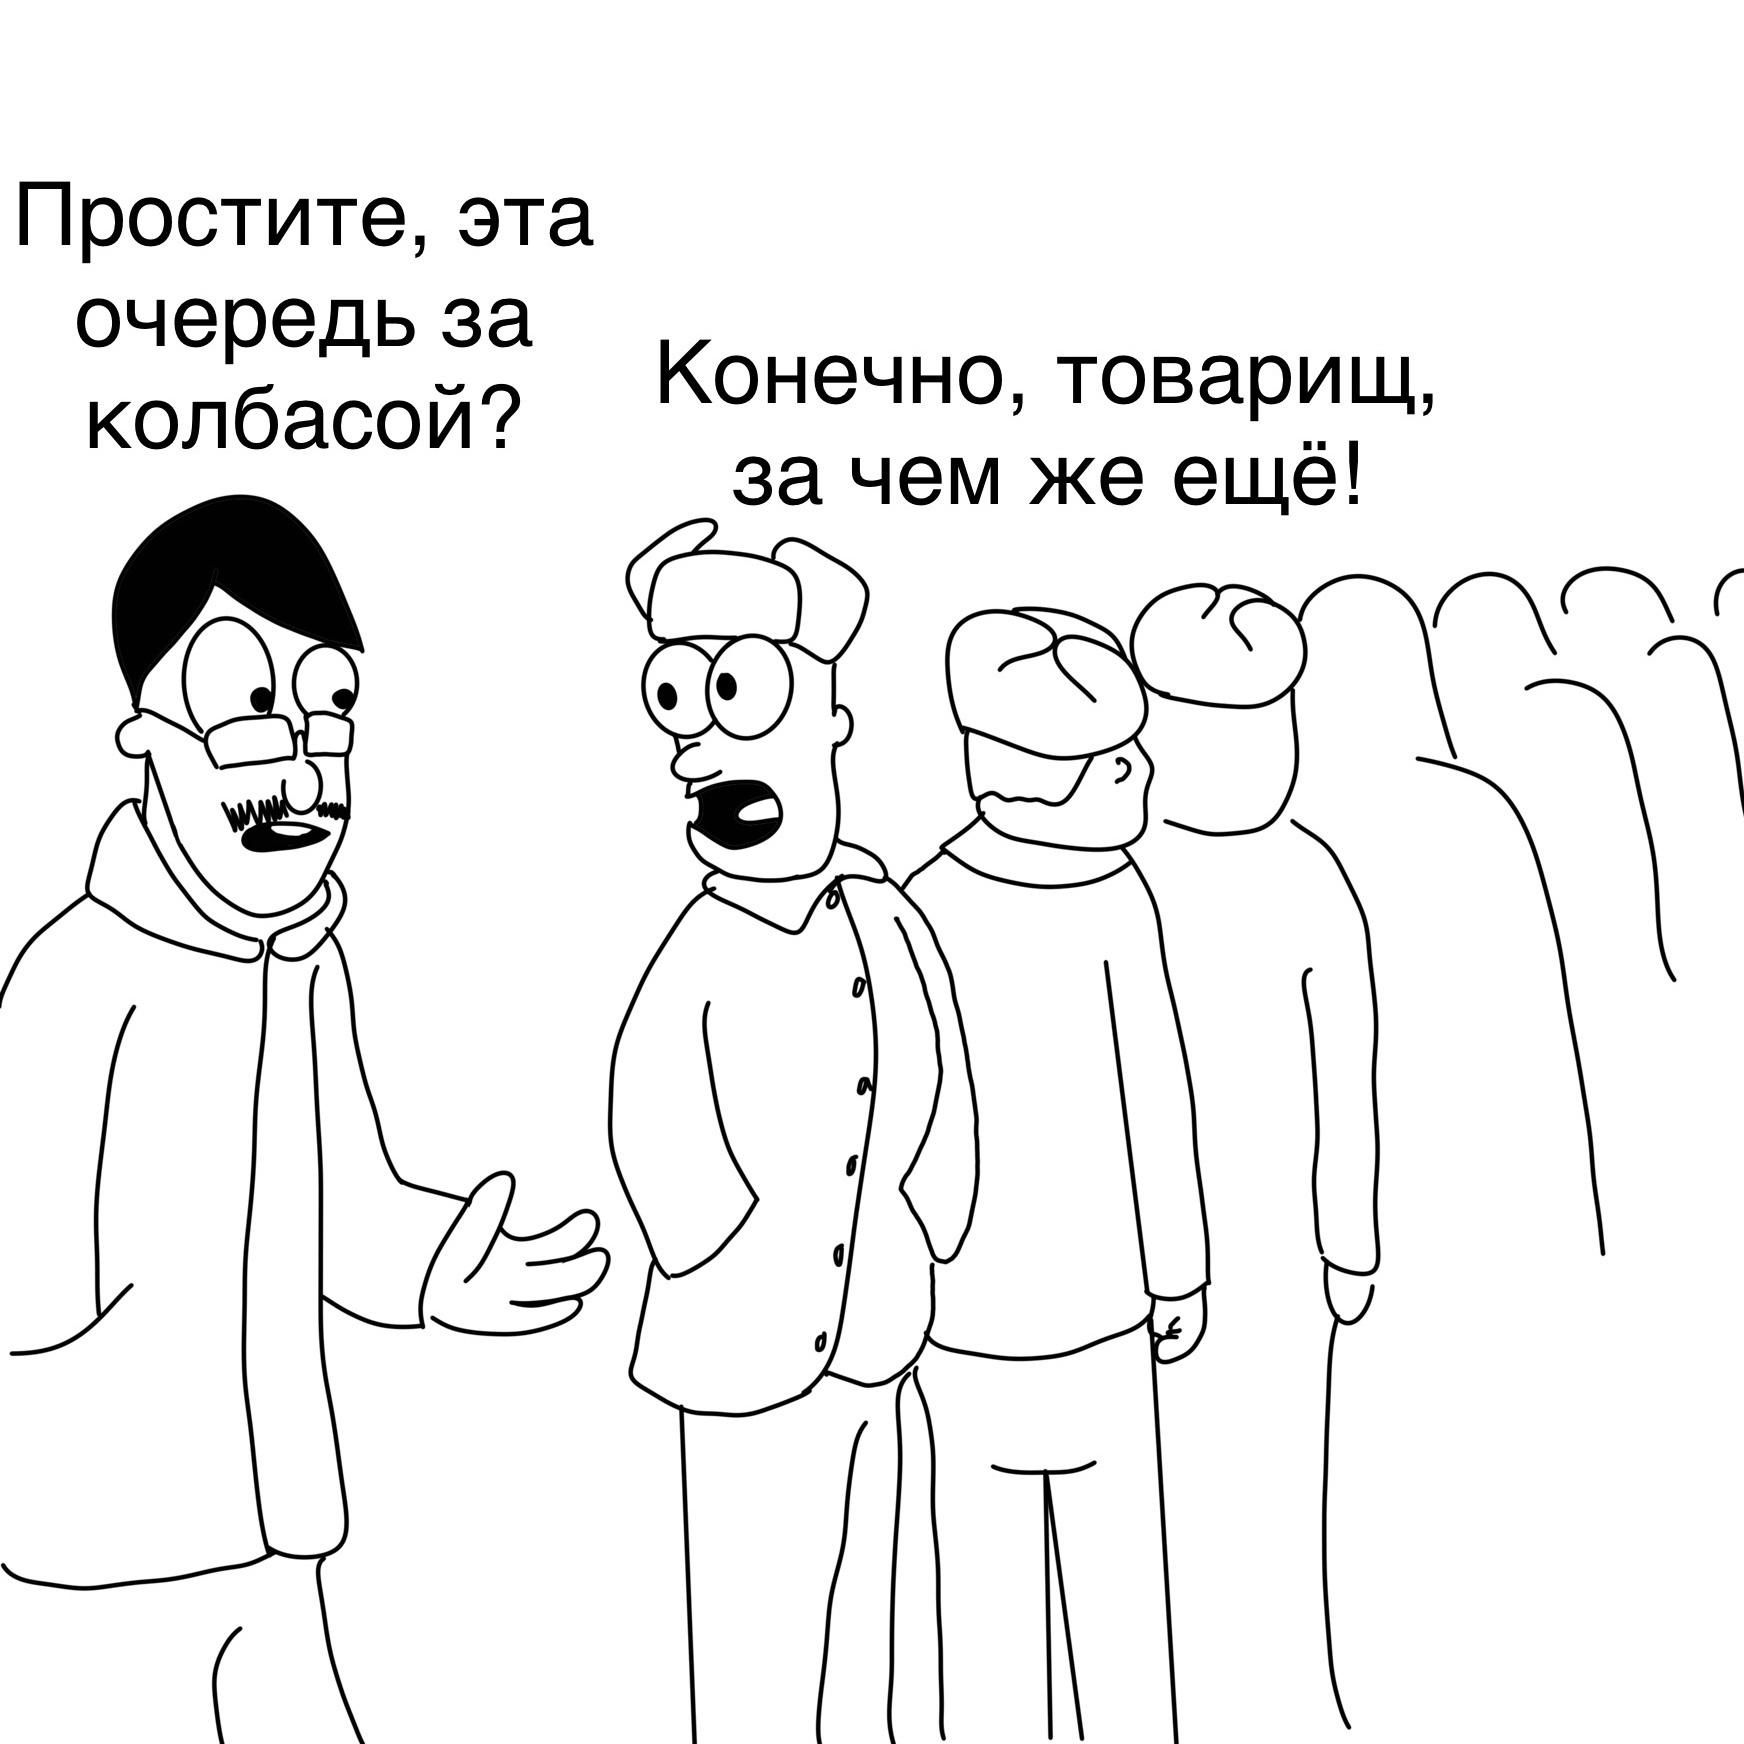 Back in USSR или Колбаса времени